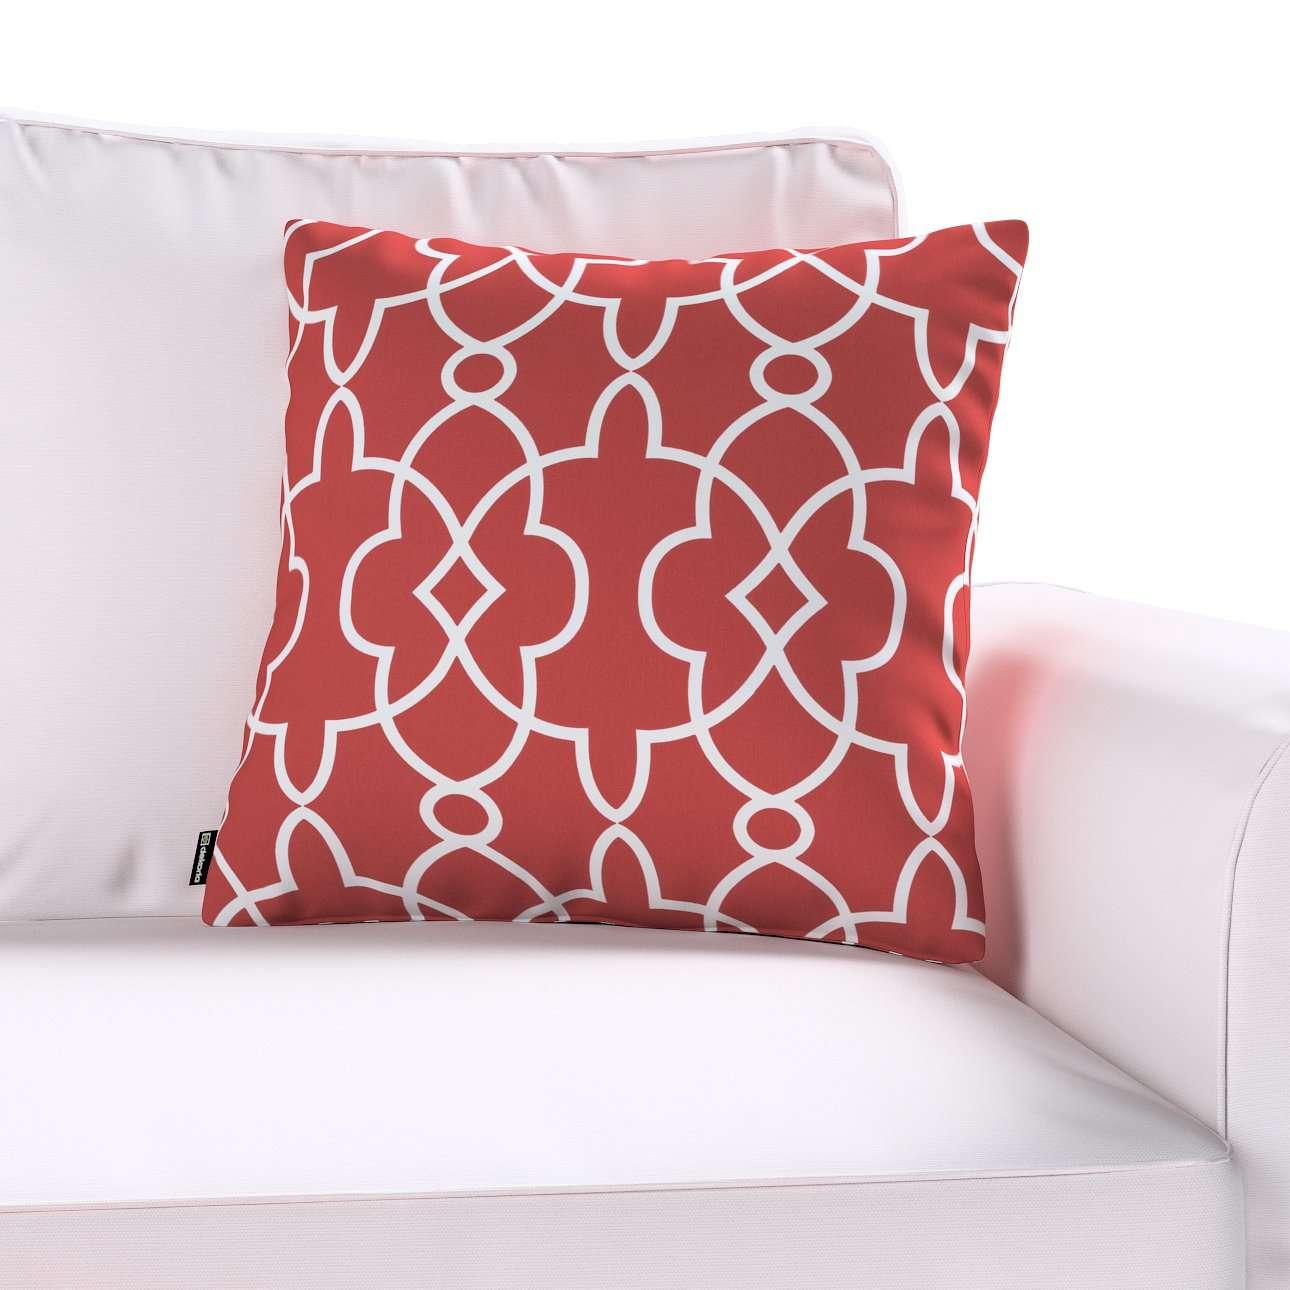 Kinga cushion cover in collection Gardenia, fabric: 142-21